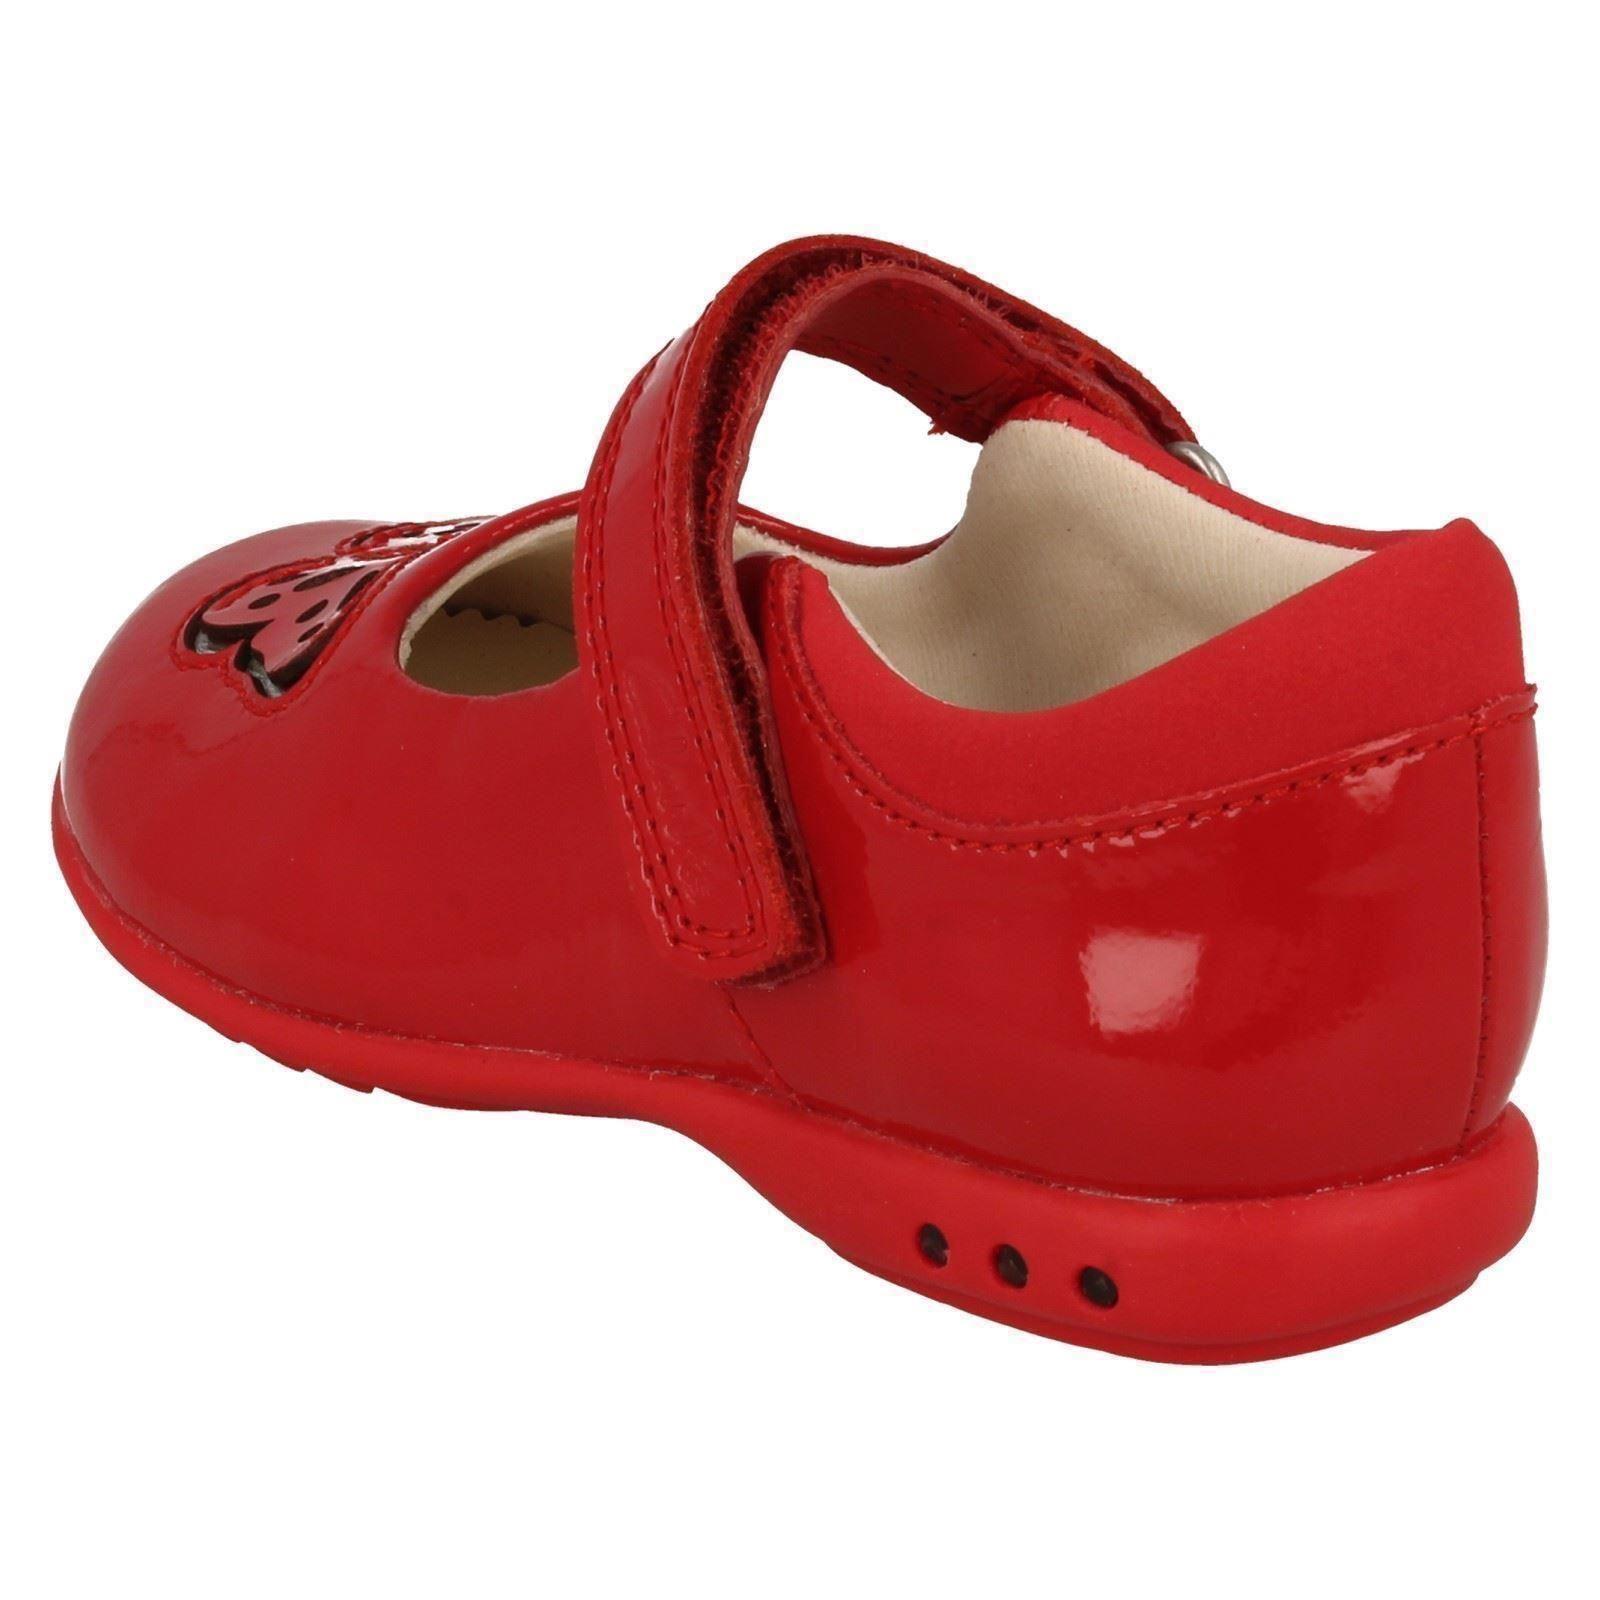 Chicas Clarks Inteligente Hook & Loop Zapatos con luces Trixi deseo